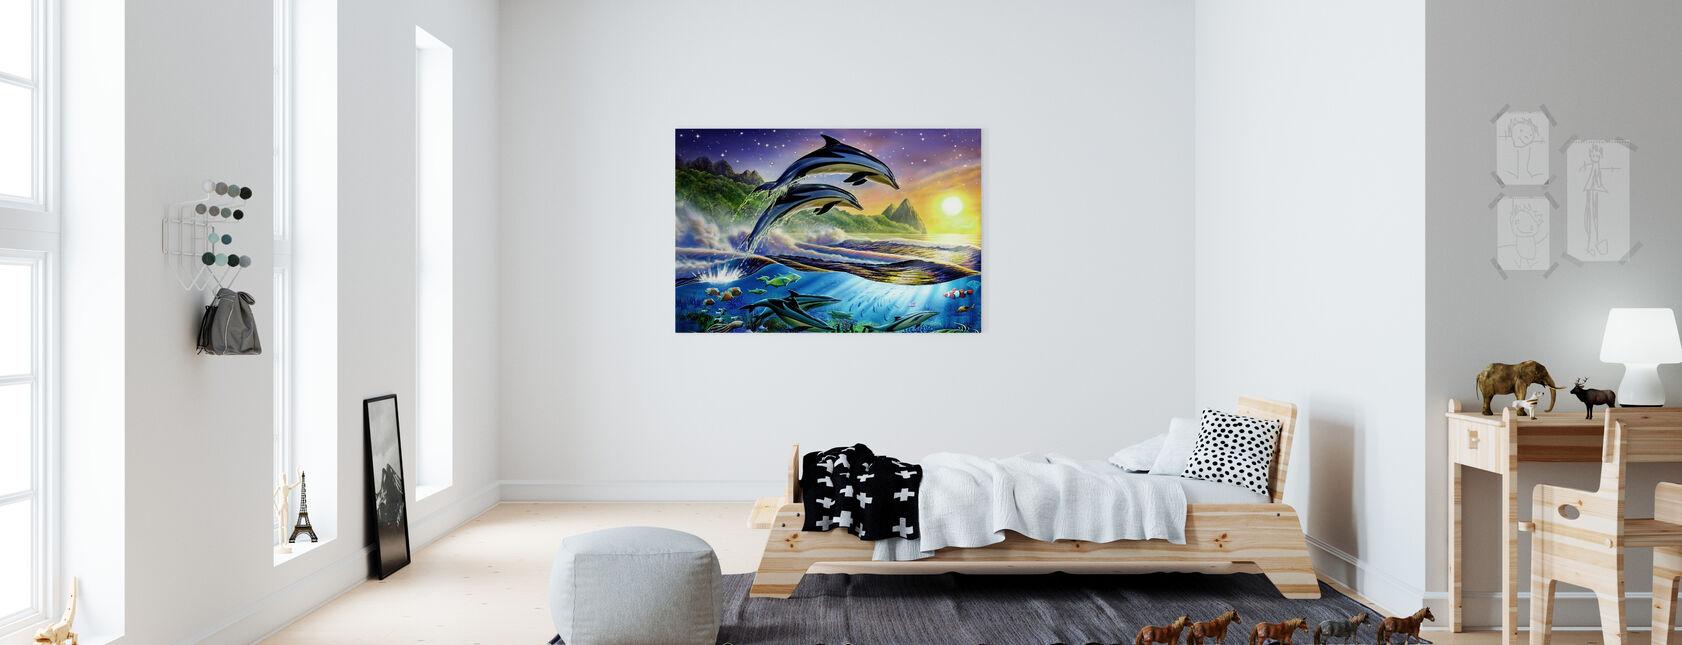 Atlantin delfiinit - Canvastaulu - Lastenhuone